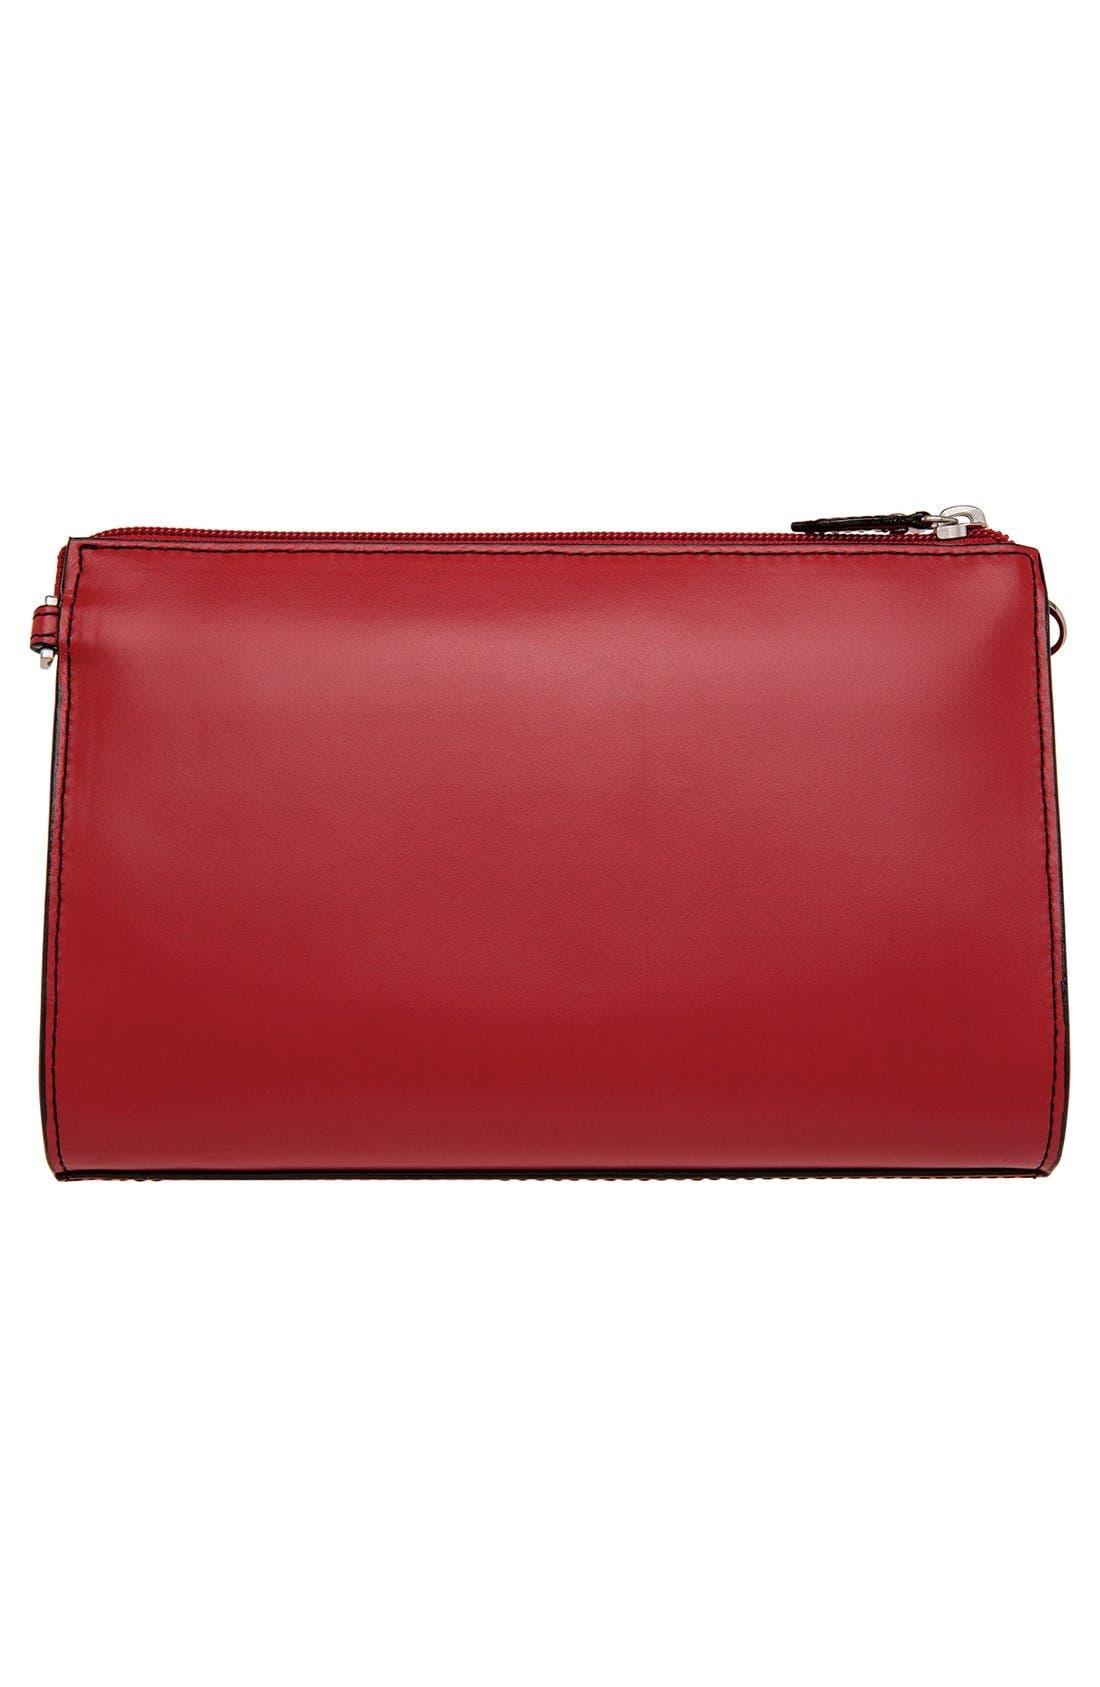 Lodis'Audrey Collection -Vicky' ConvertibleCrossbody Bag,                             Alternate thumbnail 23, color,